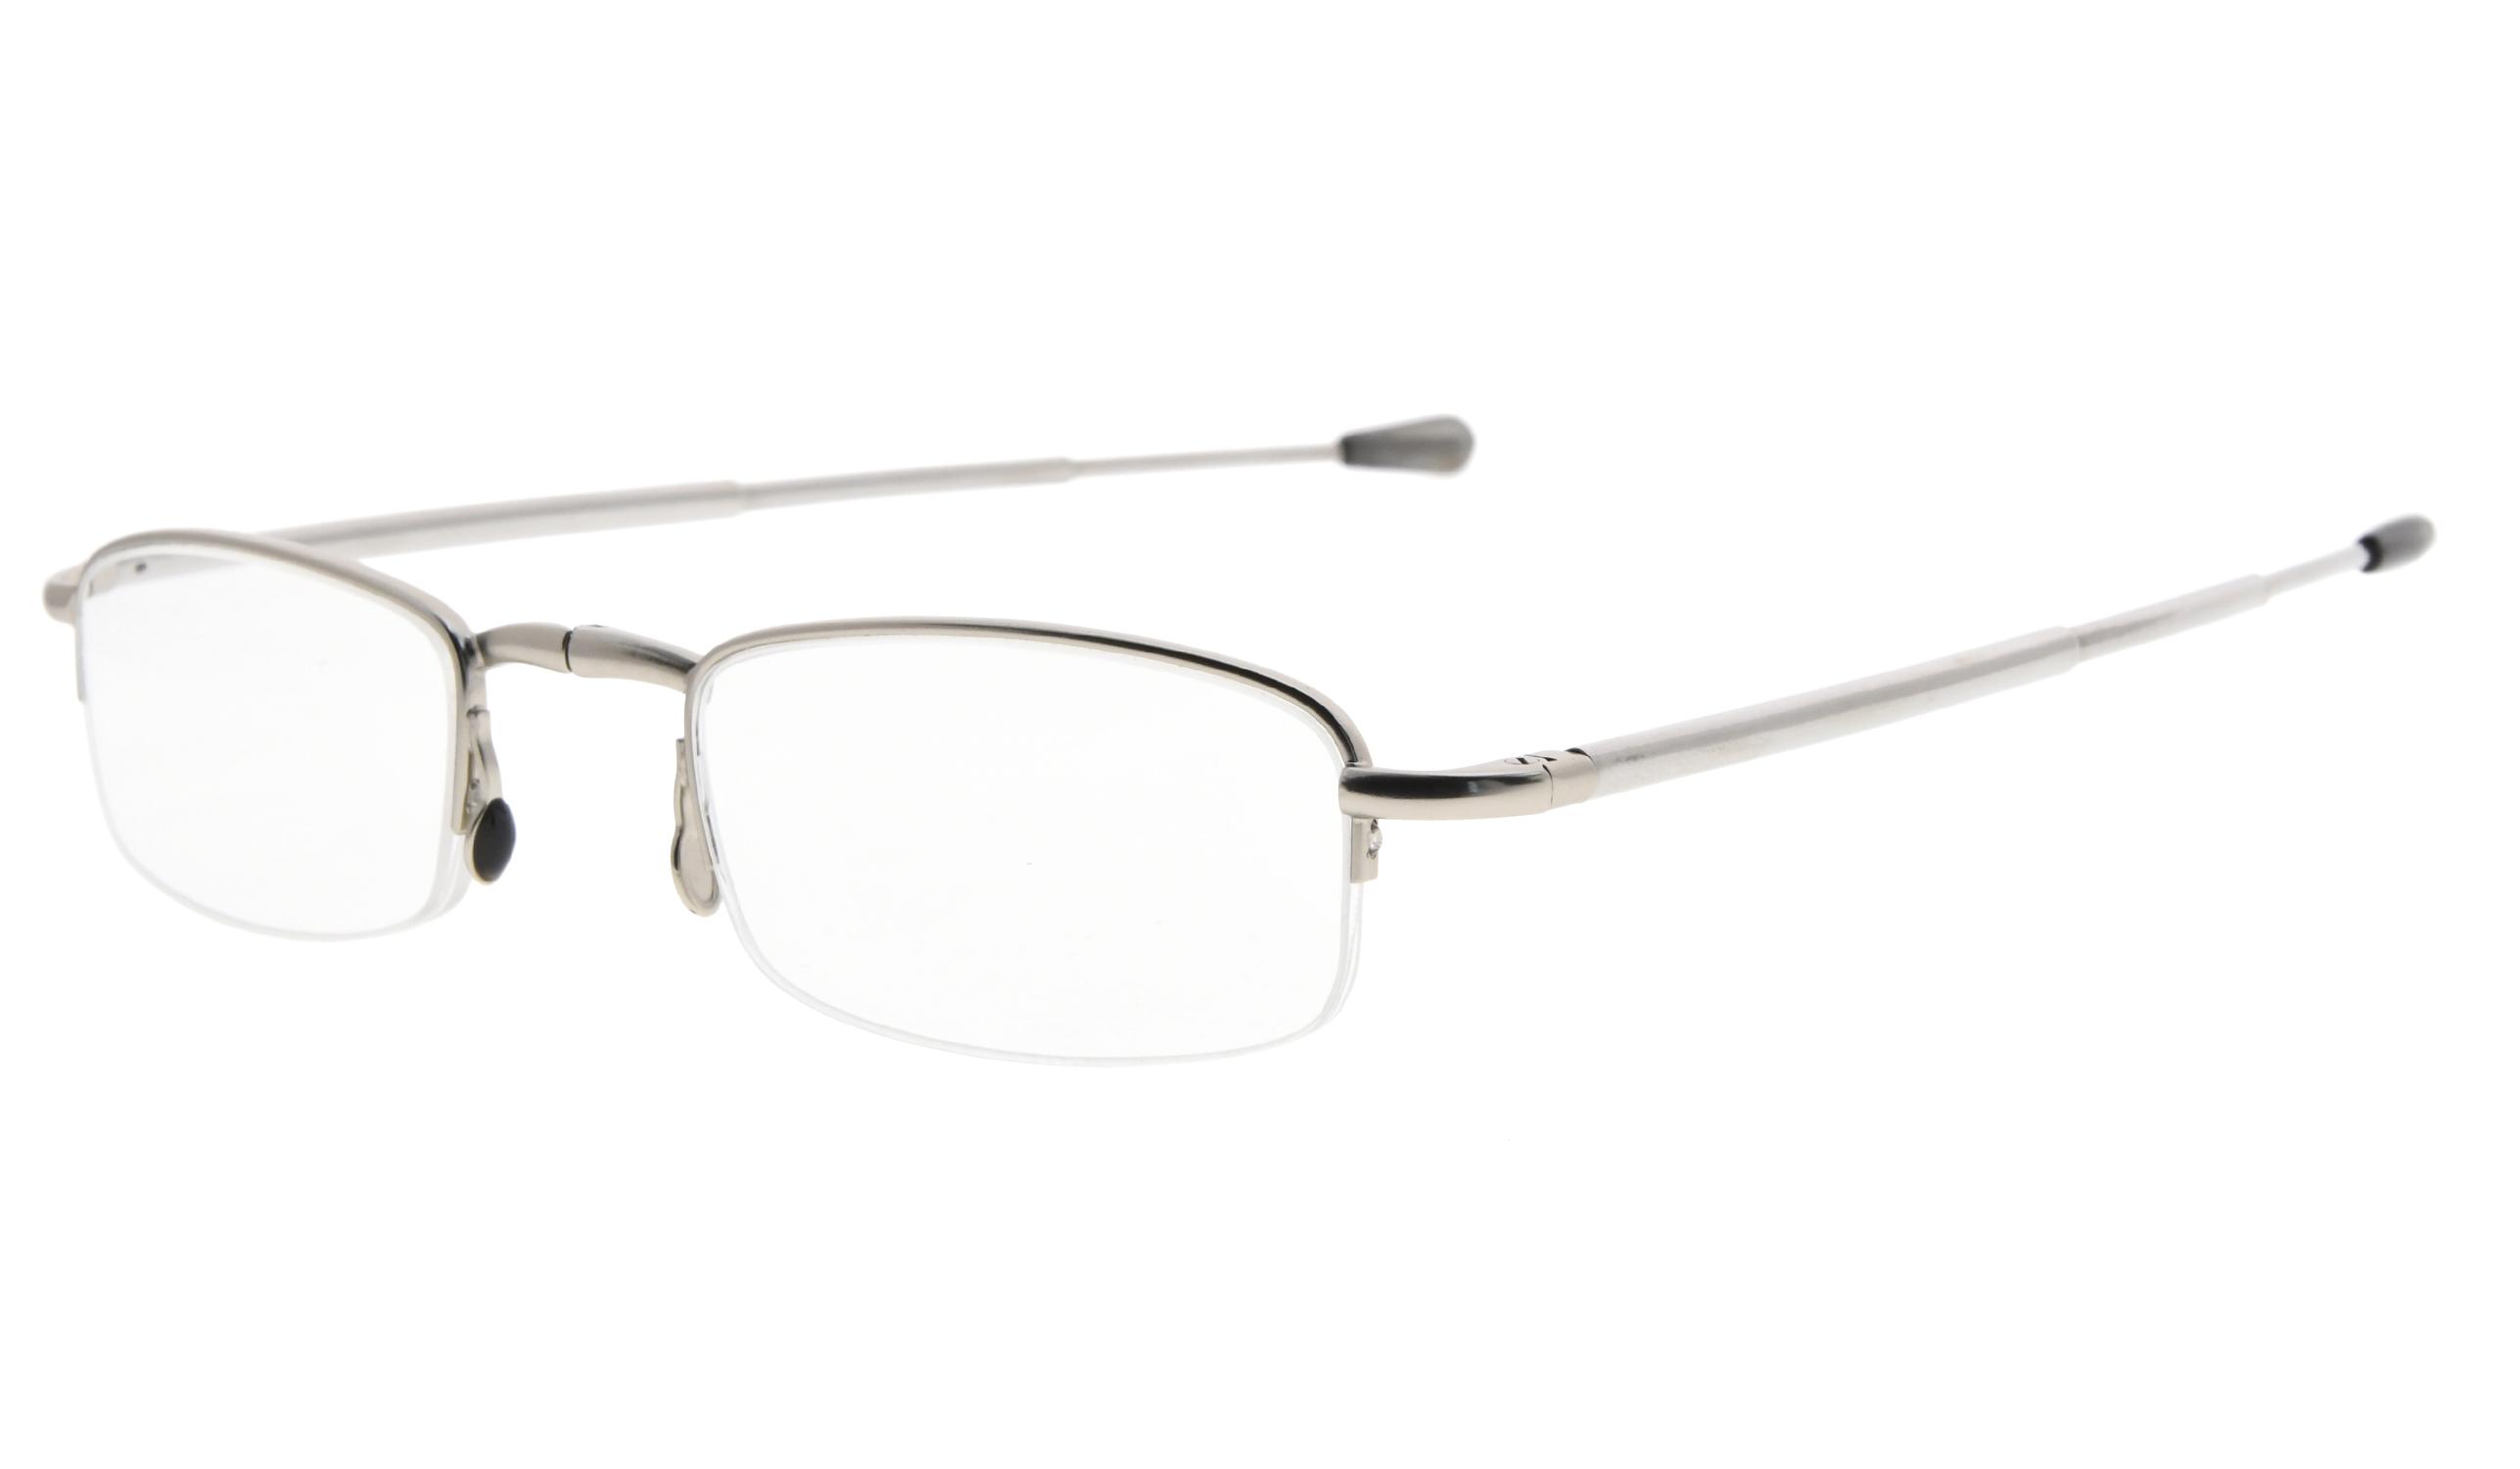 0f9e9952ddf Eyekepper Half-rim Folding Reading Glasses Fold-up Telescopic Arm Mini  Readers R1710